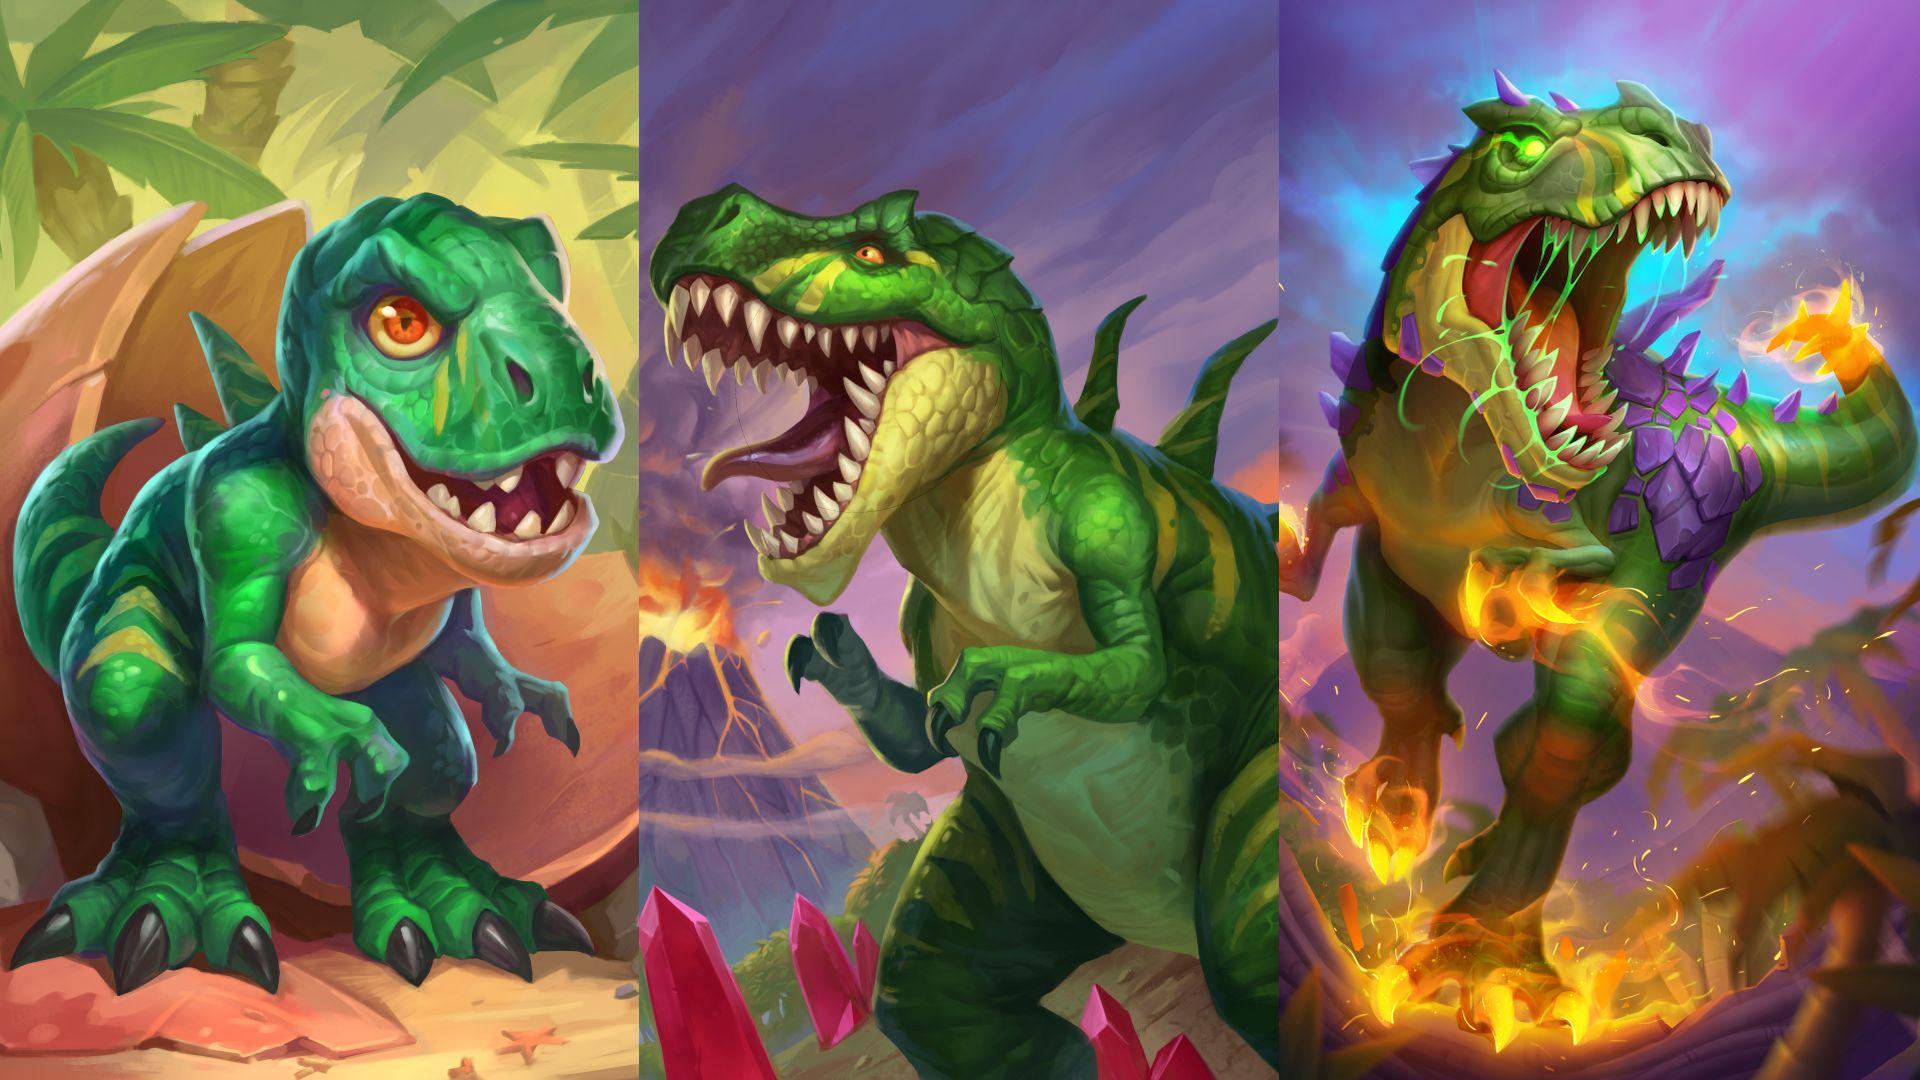 King Krush the devilsaur grows up